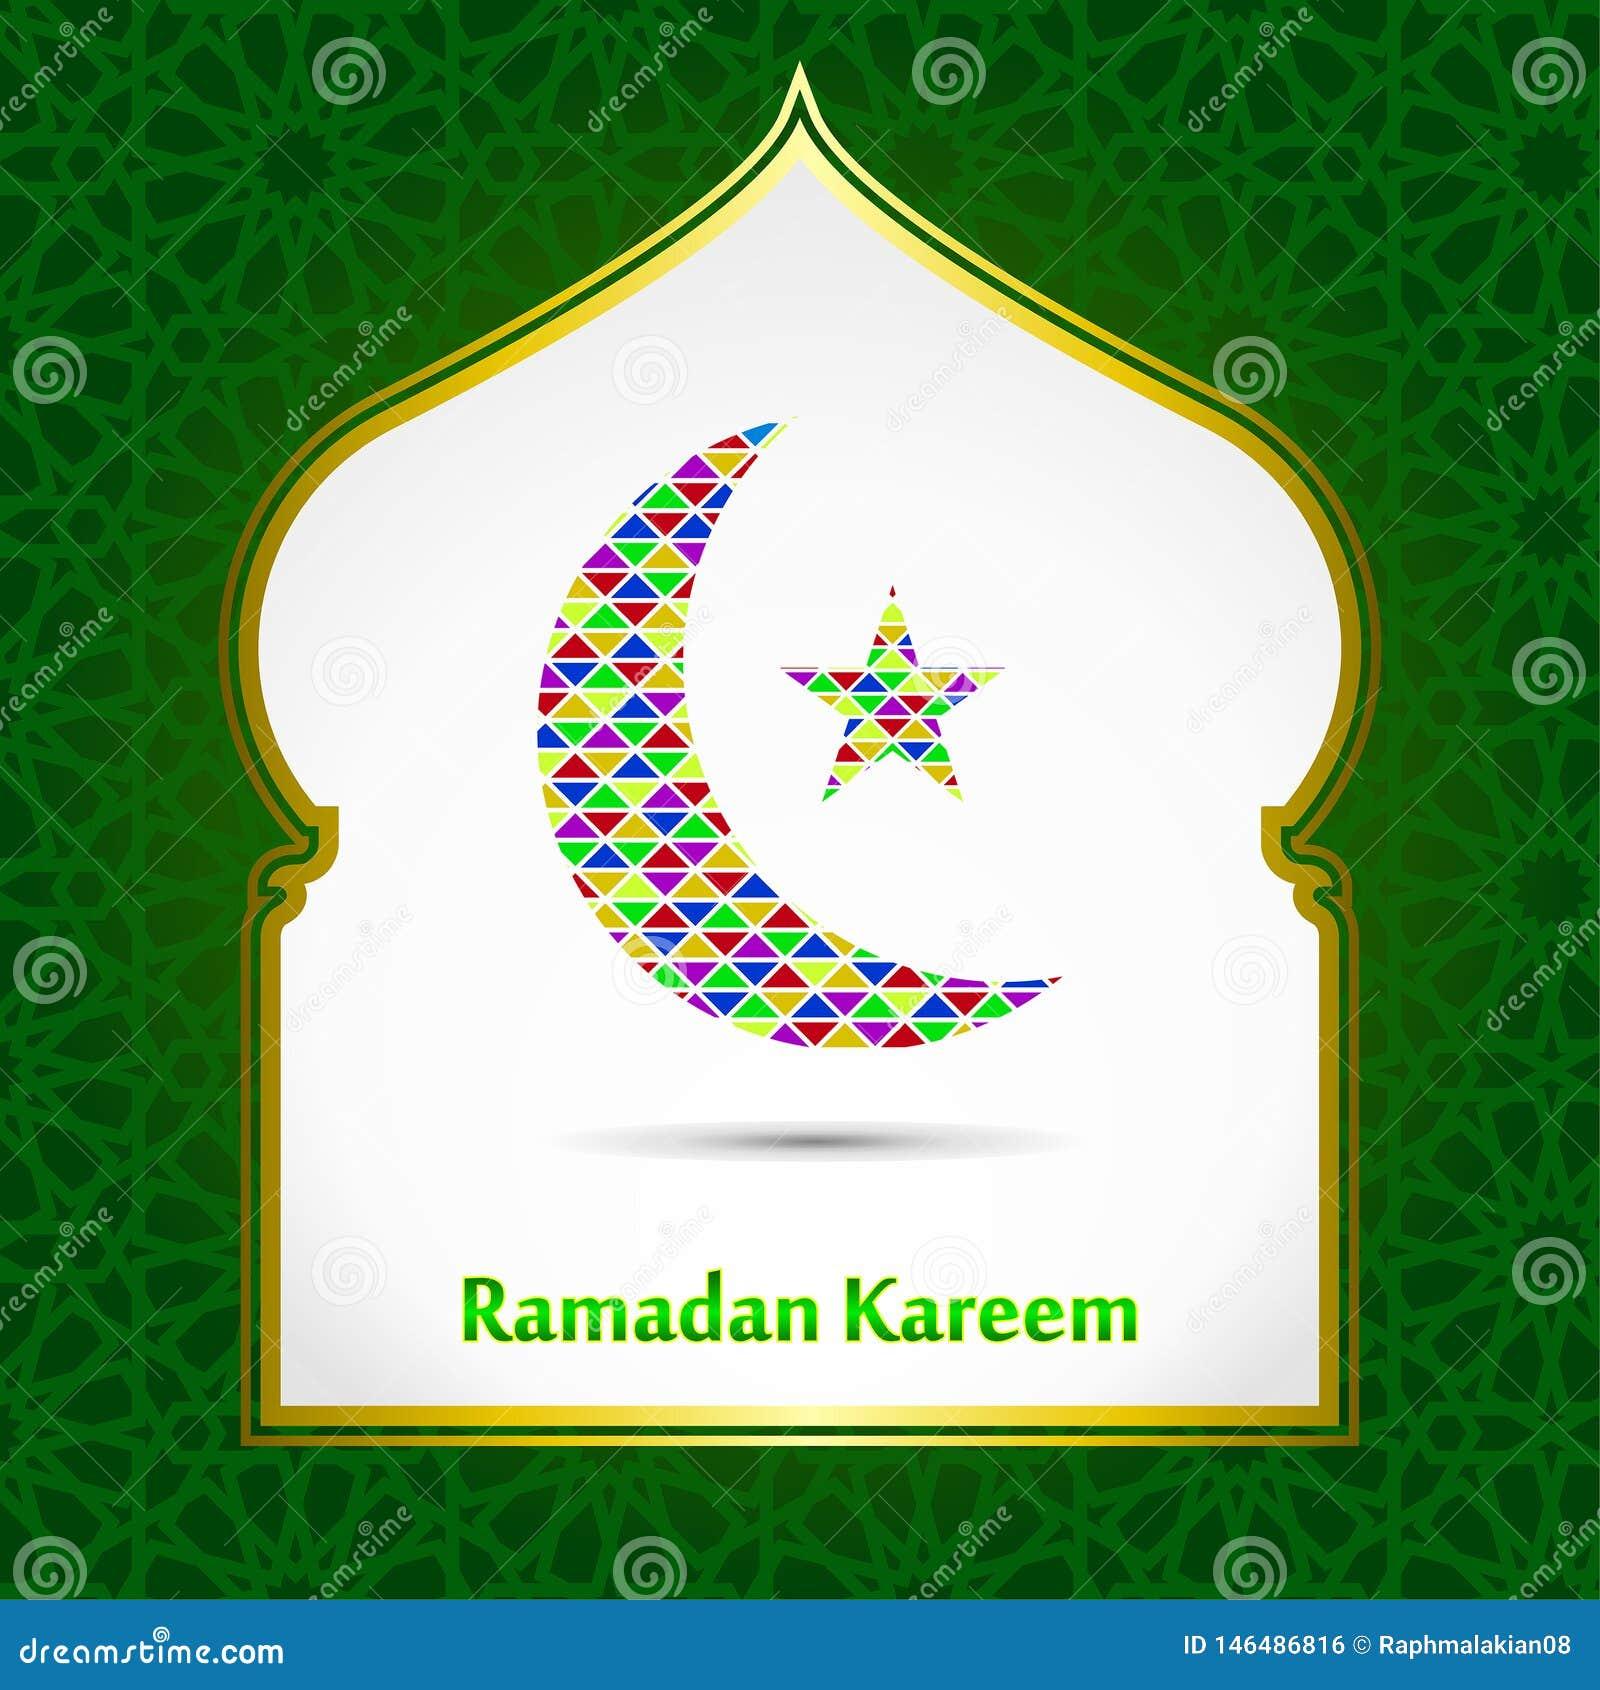 Ramadan Kareem Green Background Ramadan-Schablone